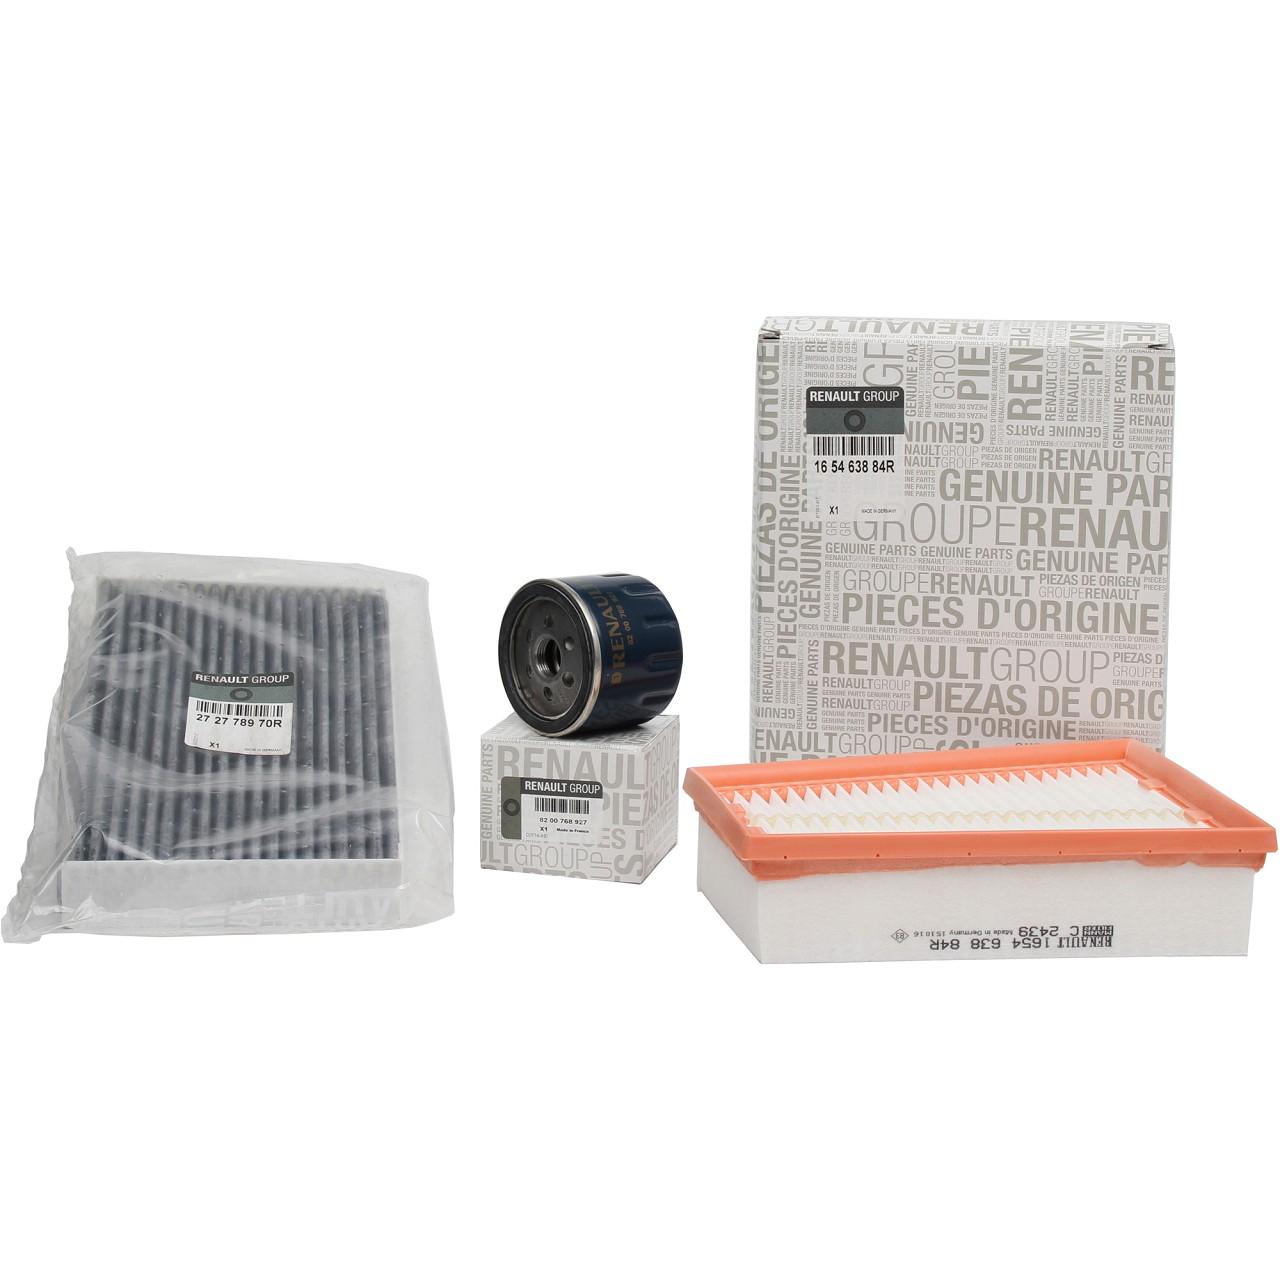 ORIGINAL Renault Inspektionskit Filterpaket MEGANE III 2.0TCe / RS 180-265 PS